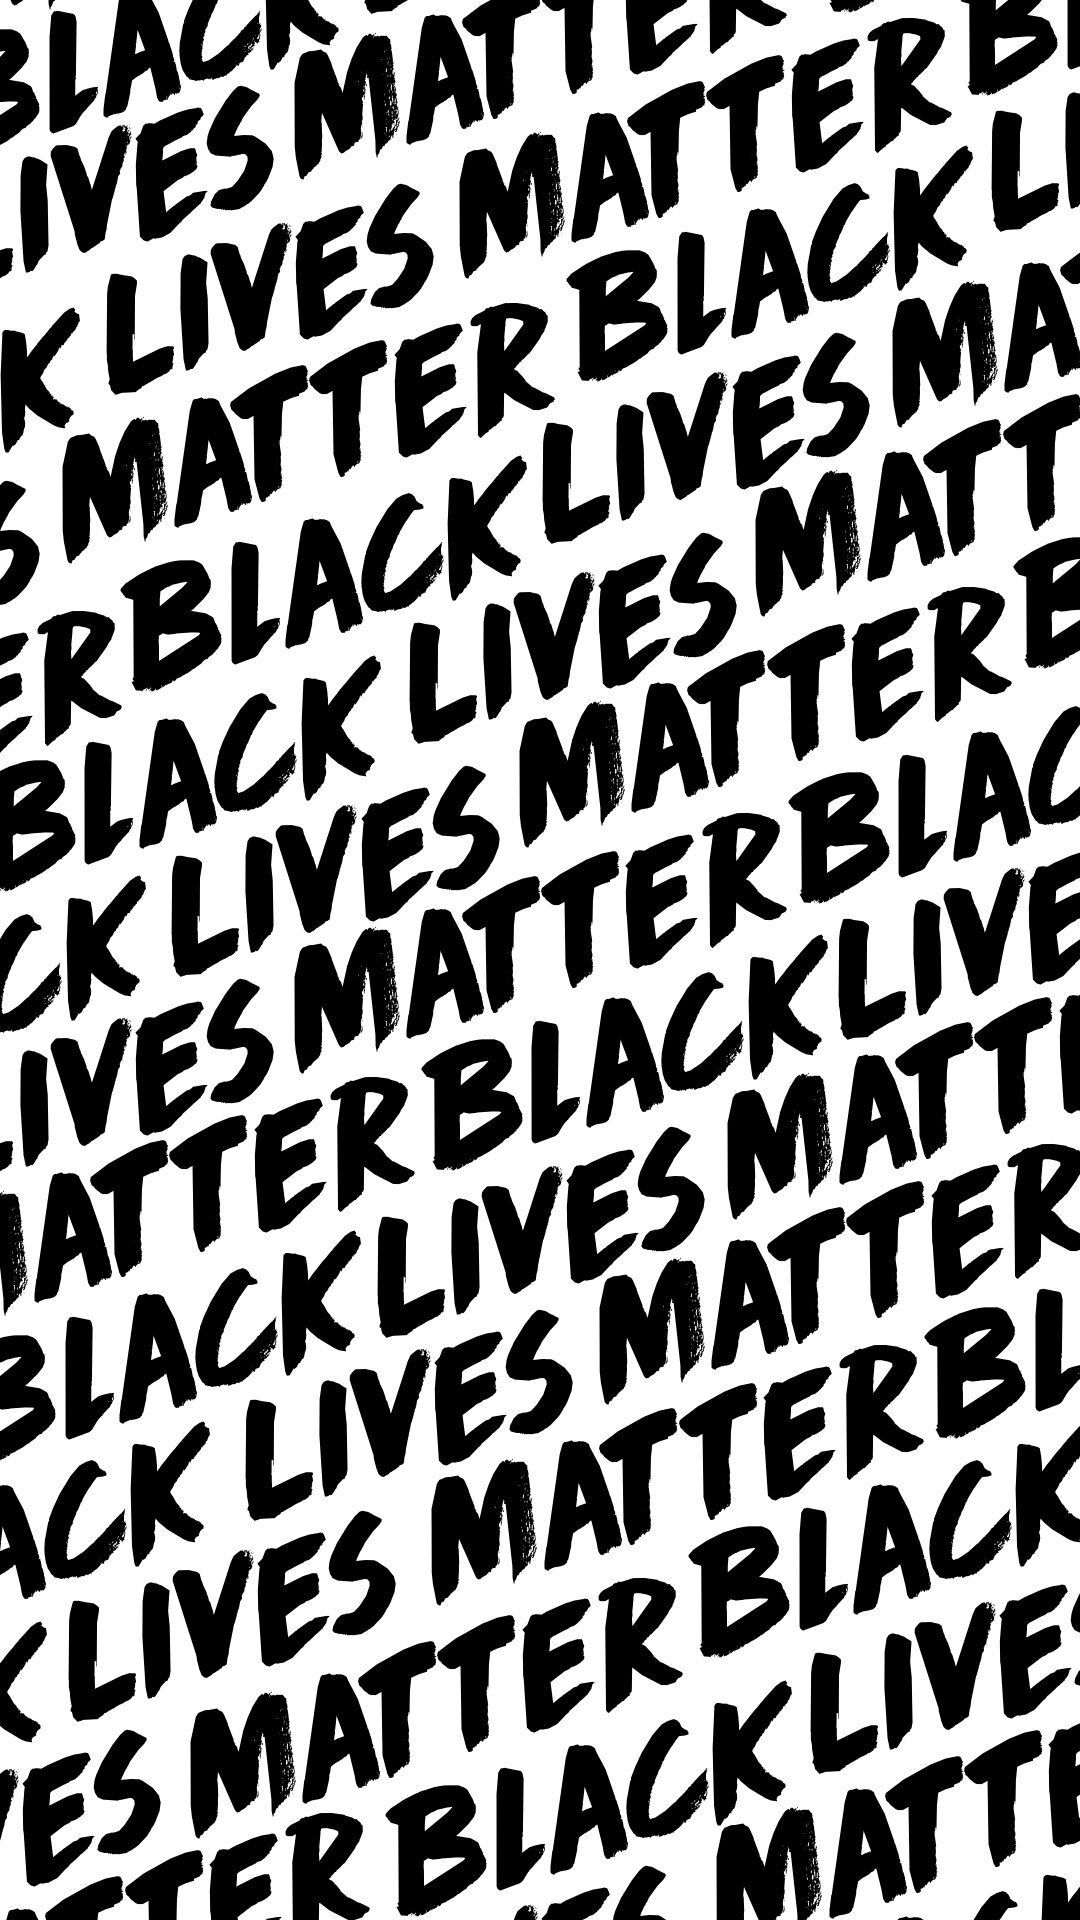 Cute Wallpapers Black Lives Matter